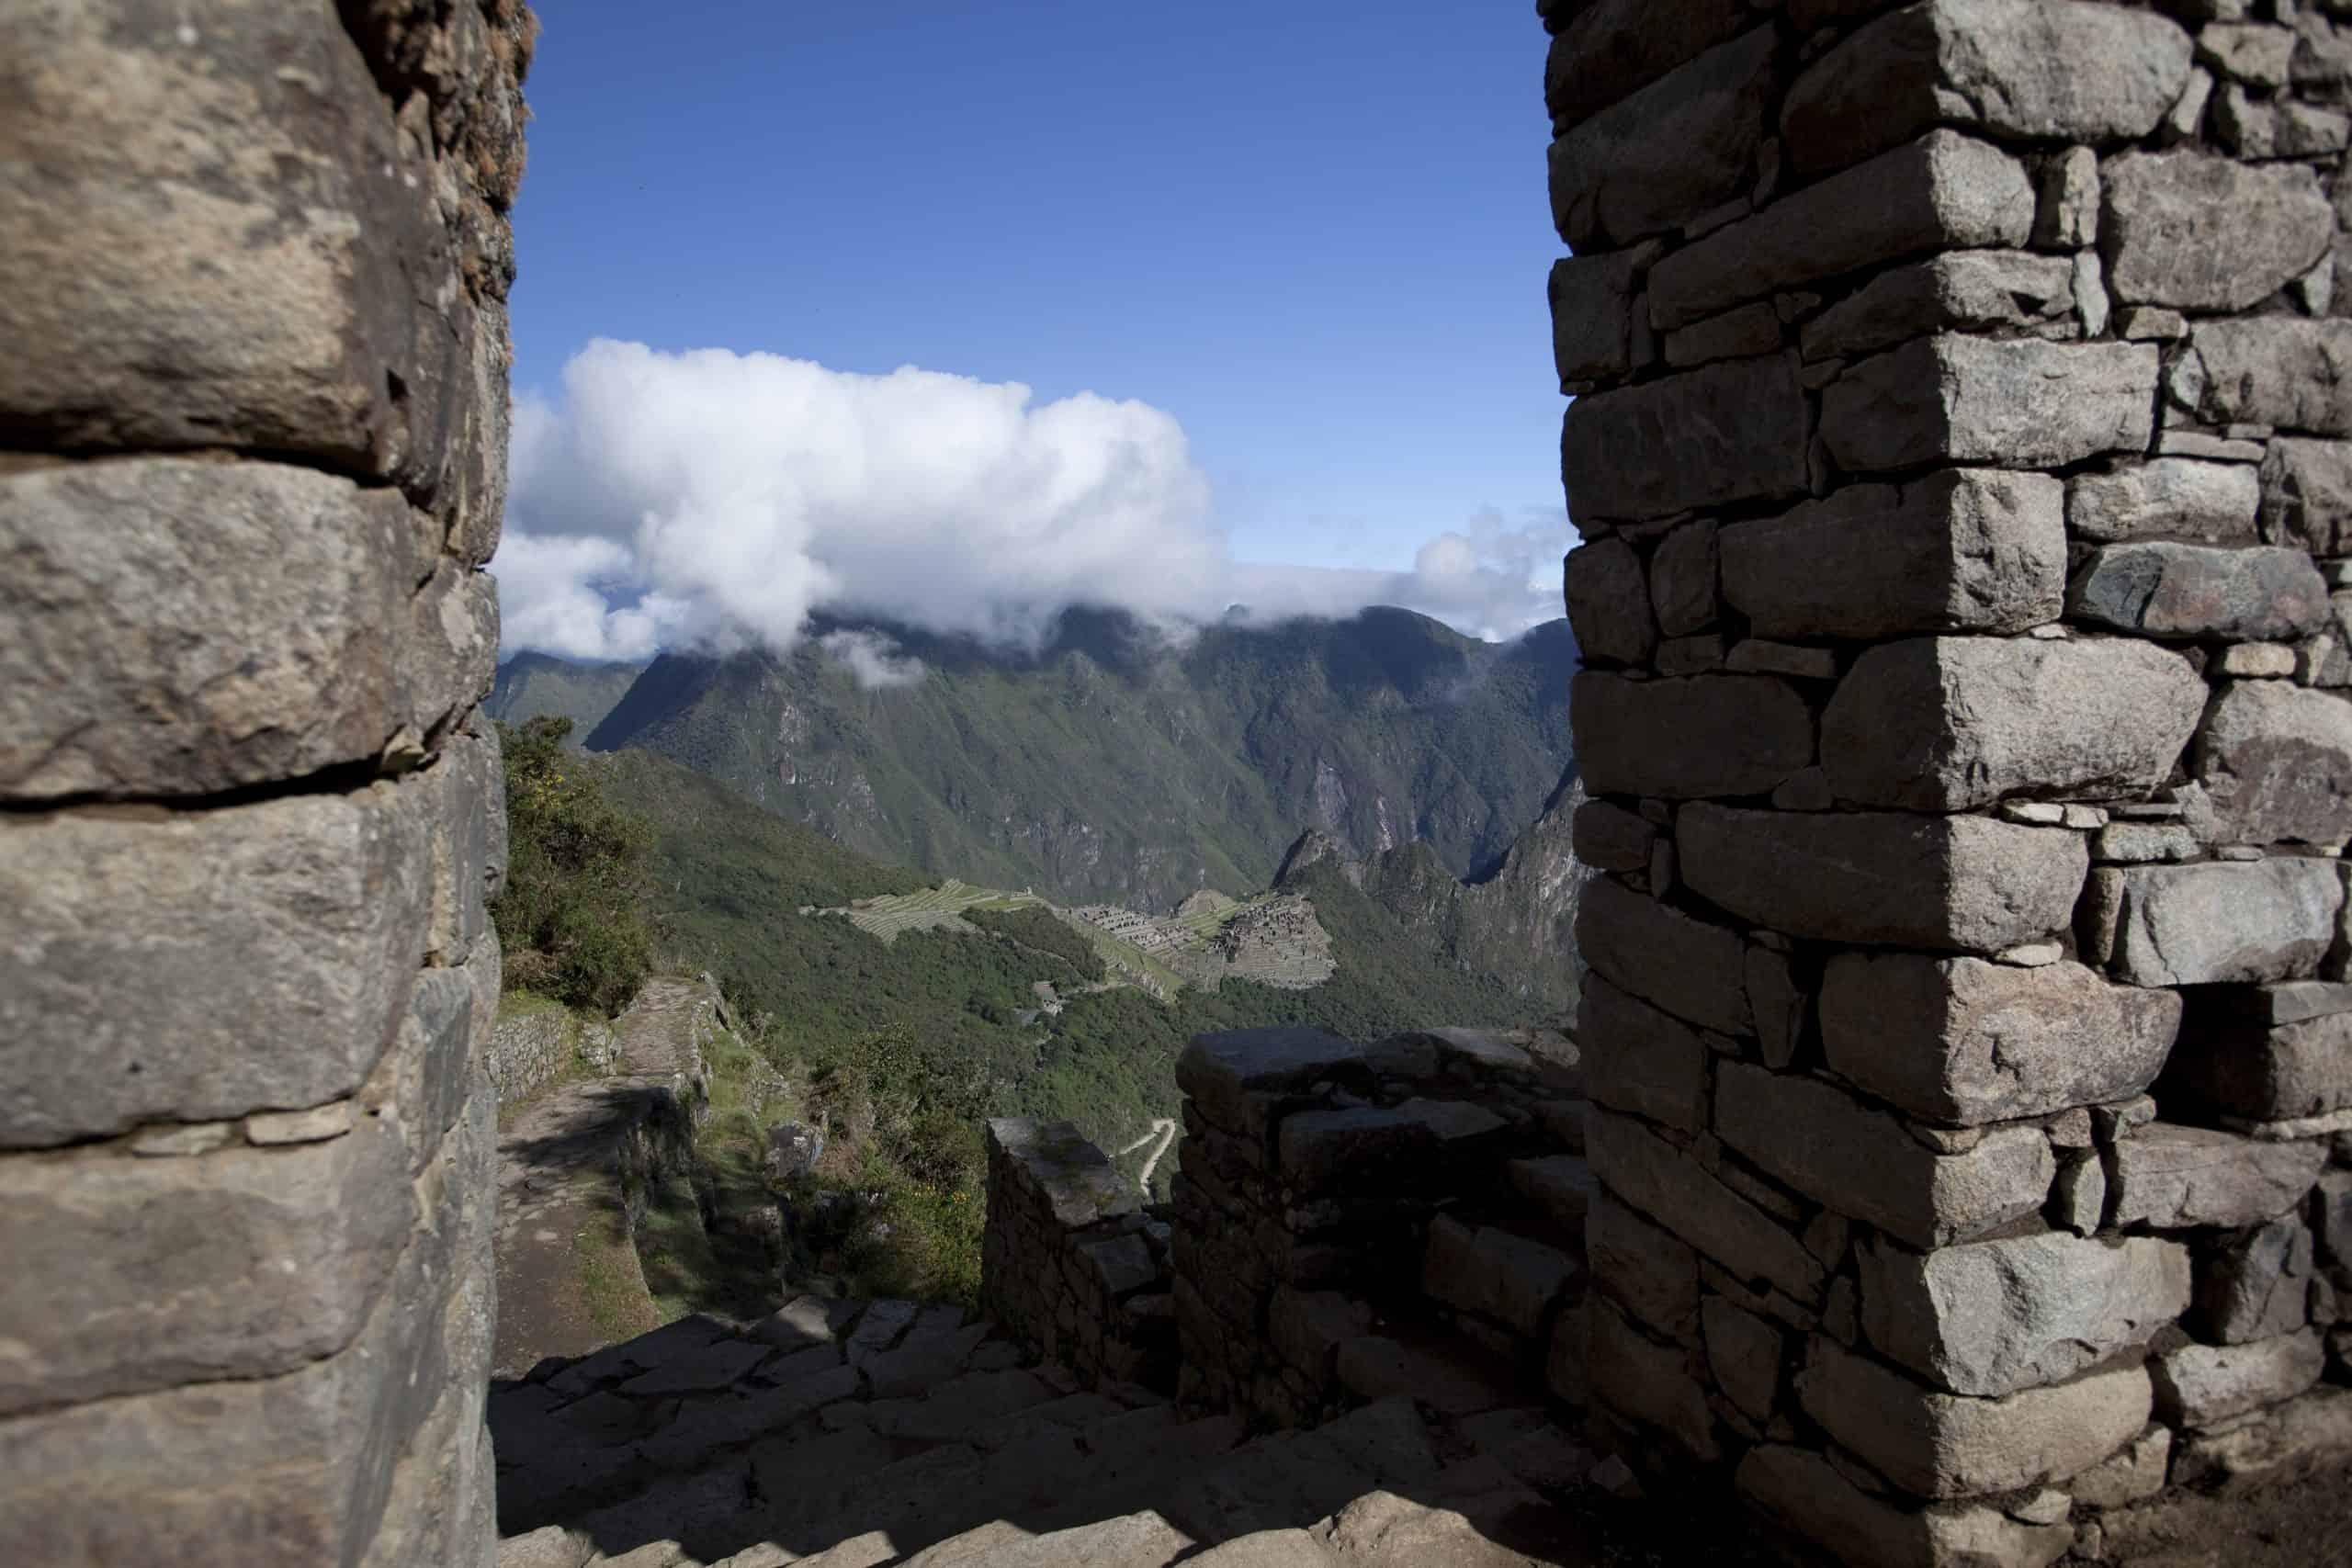 Vista Panorámica del Santuario Histórico Machu Picchu desde Intipunku